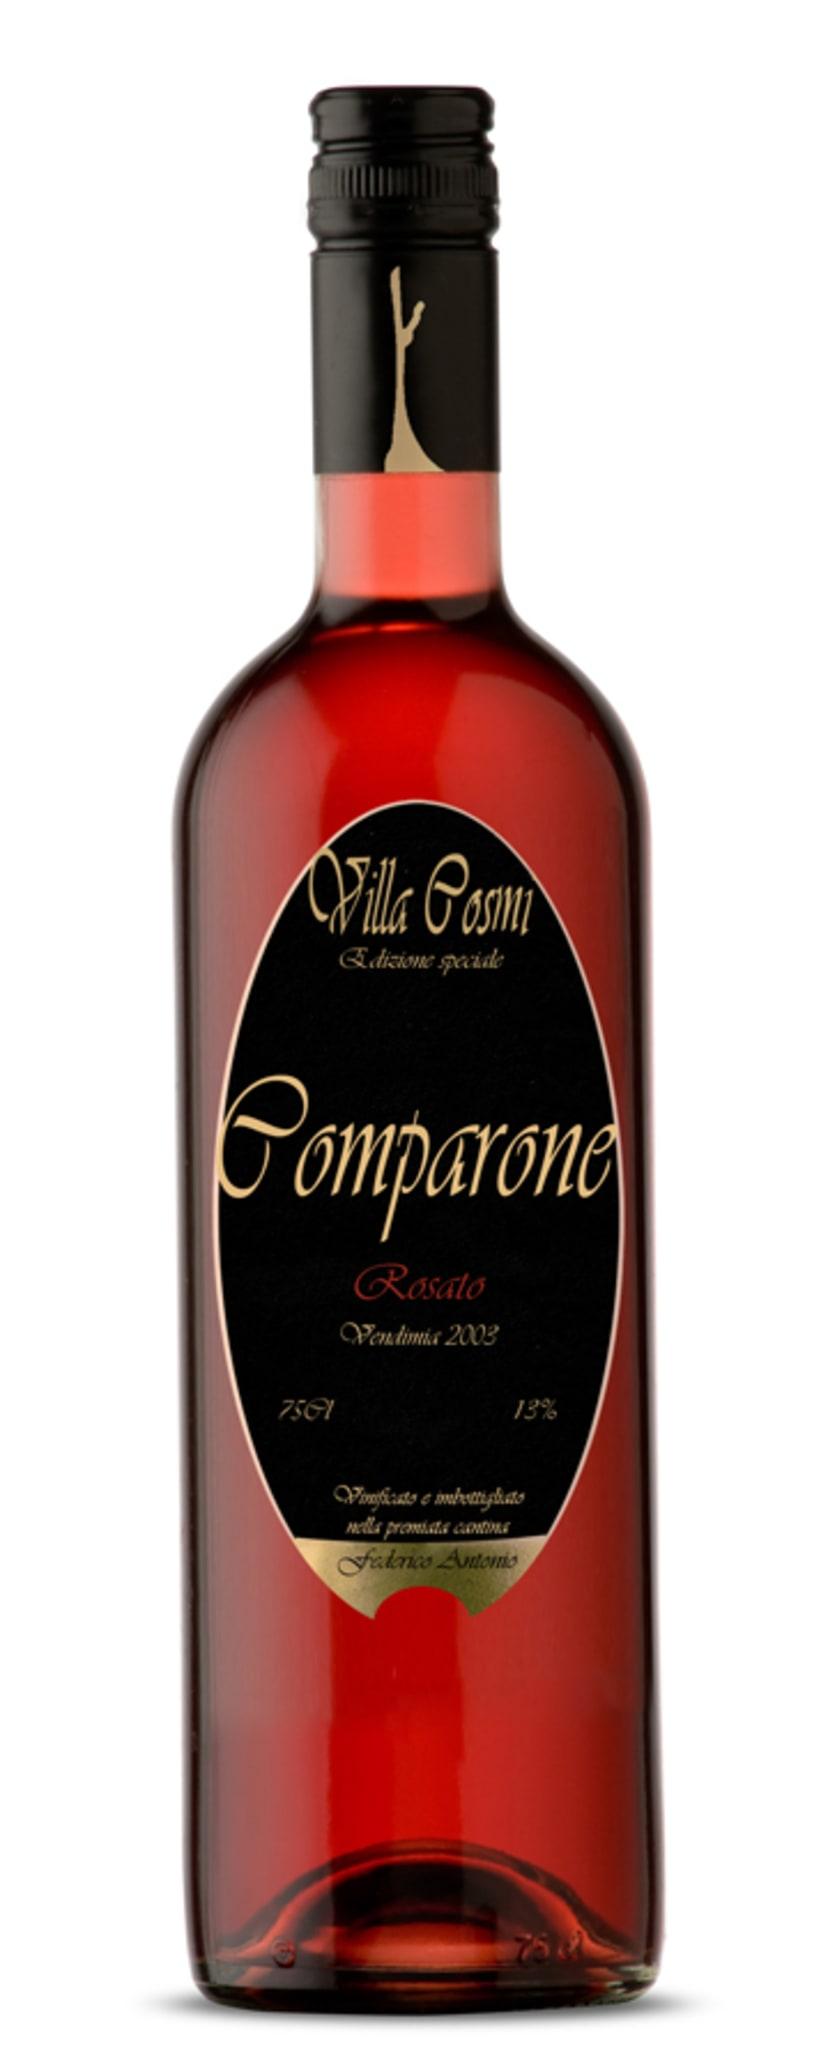 etiquetado vino rosado comparone 1